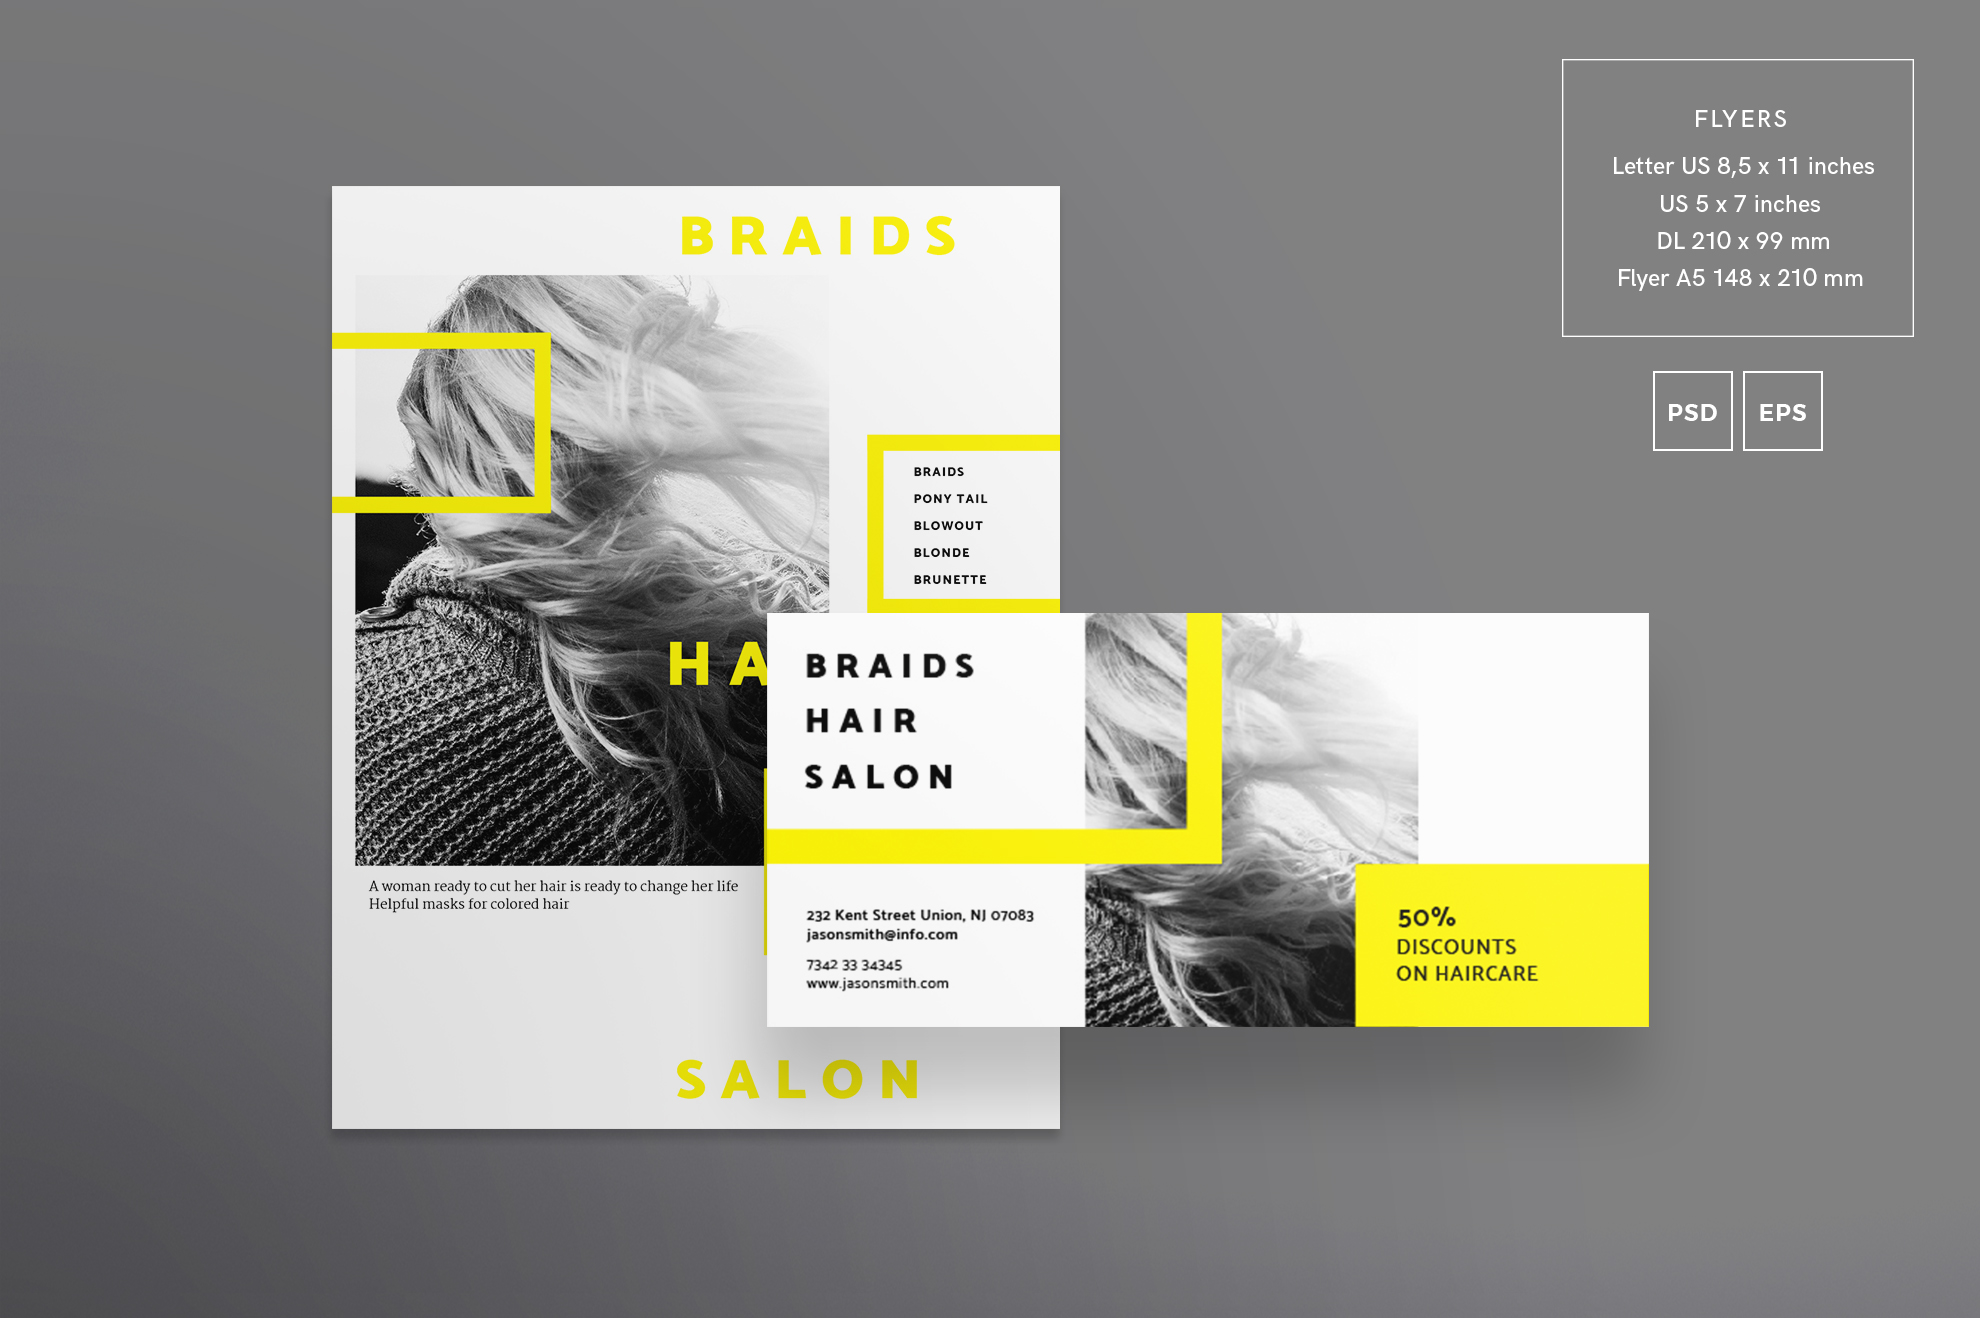 Hair Salon Barbershop Design Templates Bundle example image 8